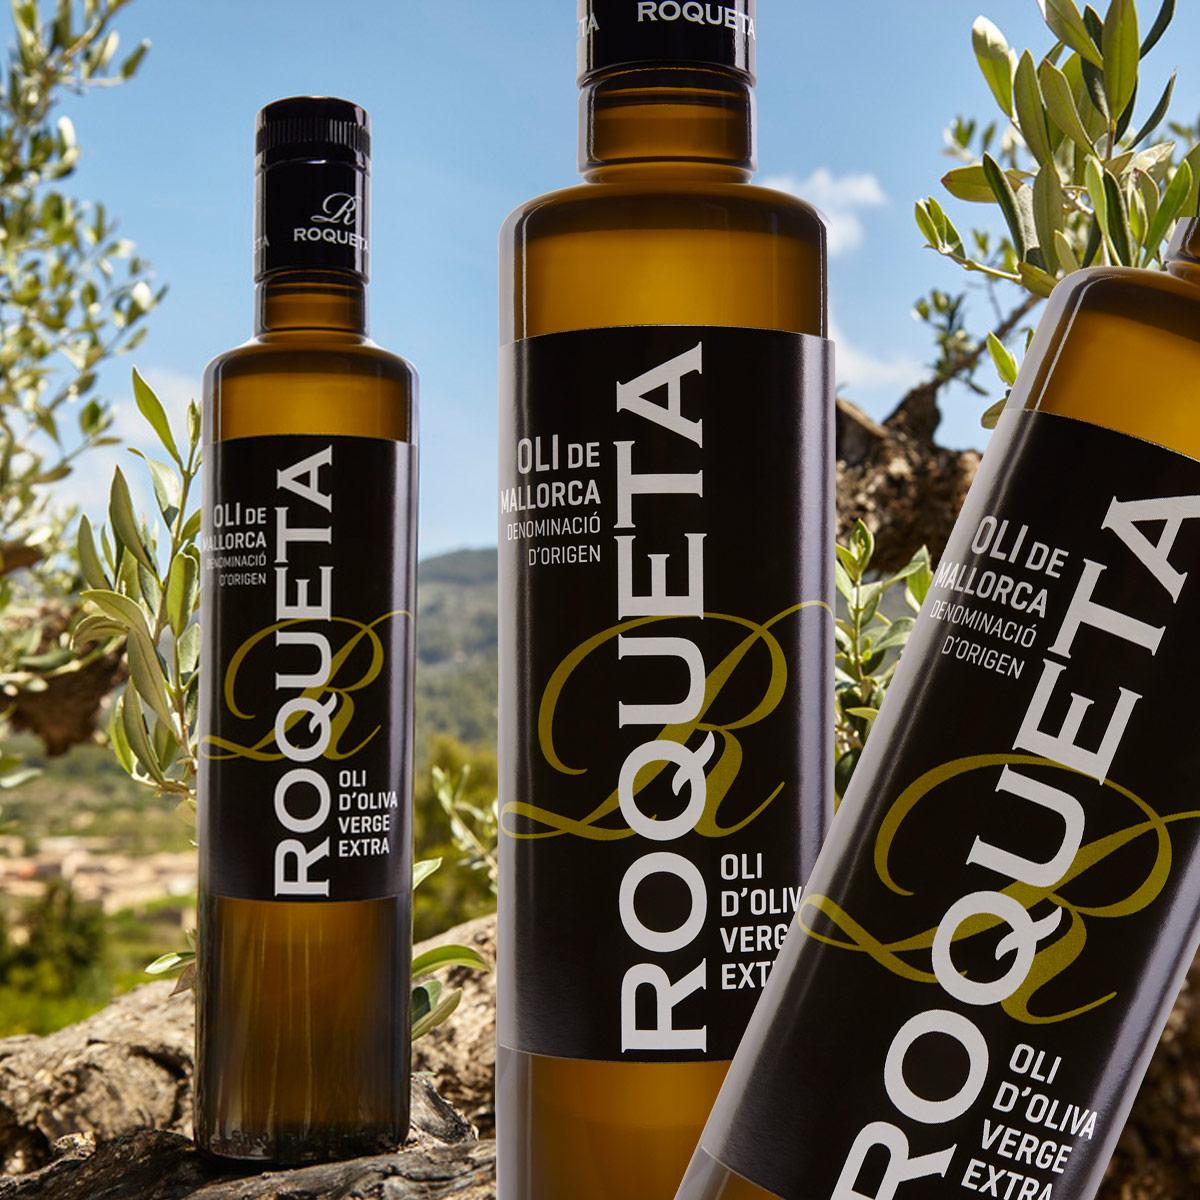 6 x Roqueta Olive Oil Virgen Extra D.O.